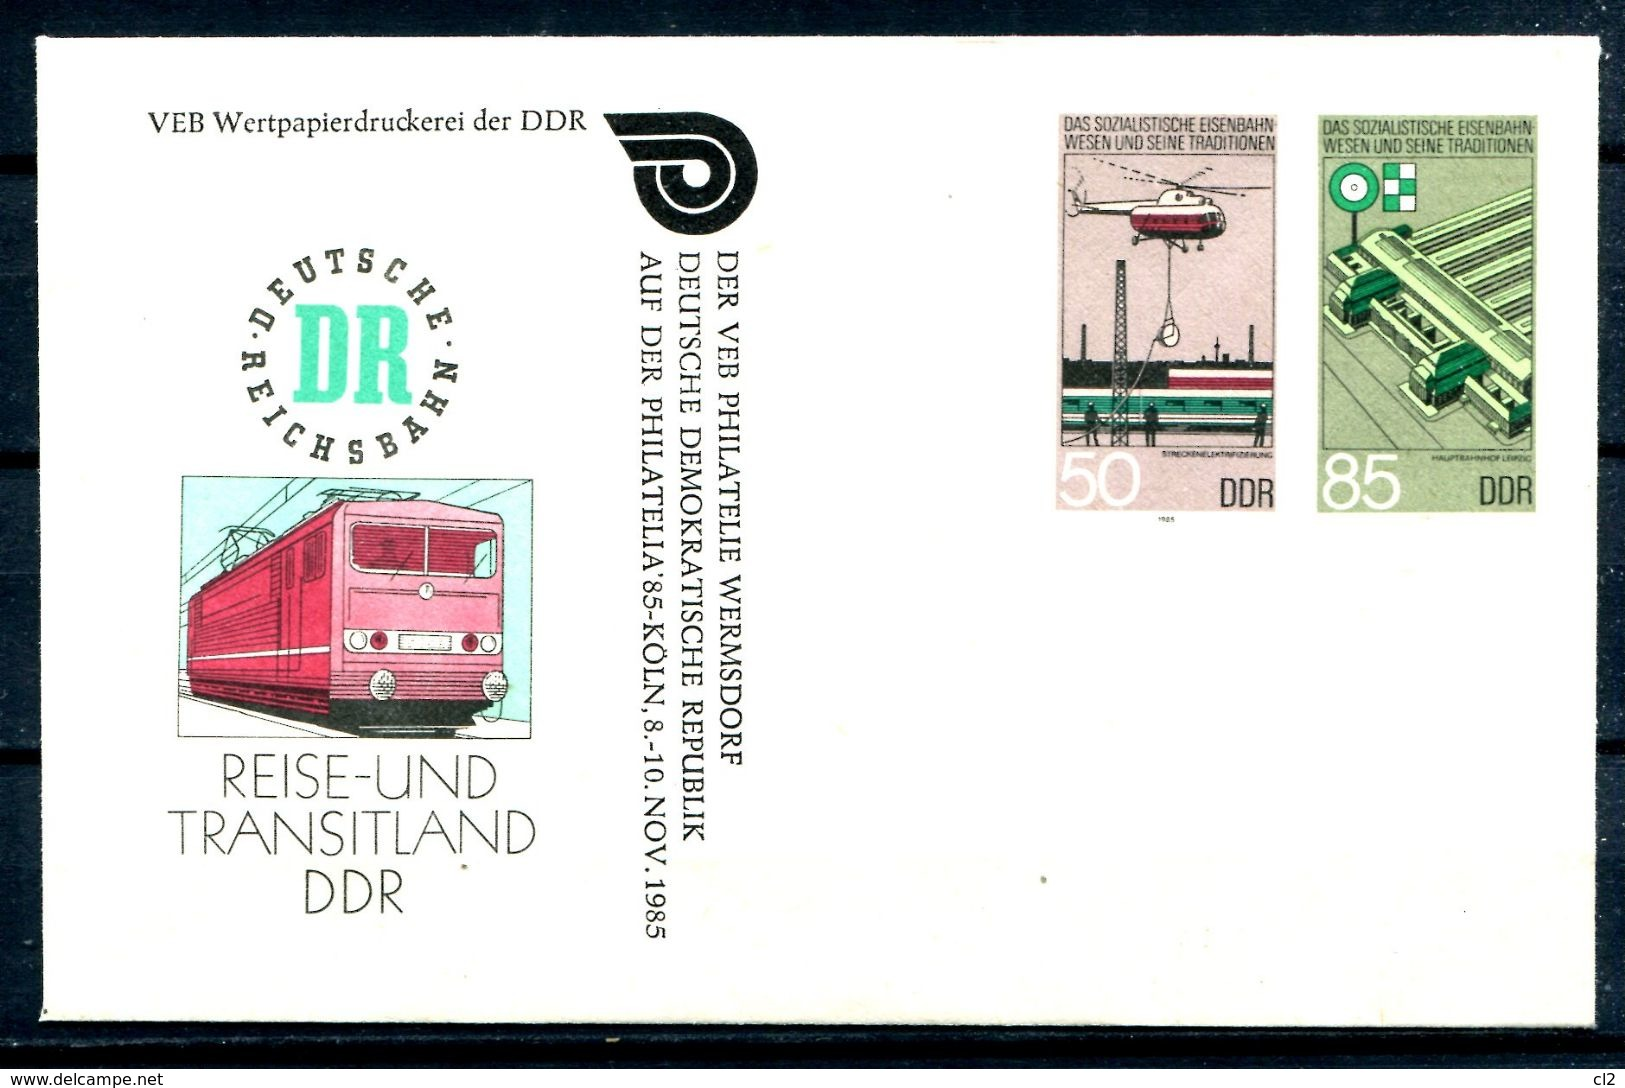 REPUBLIQUE DEMOCRATIQUE ALLEMANDE - Ganzsache Michel U3 Mit Privatzudruck (PHILATELIA 85 KOLN) - Private Covers - Mint